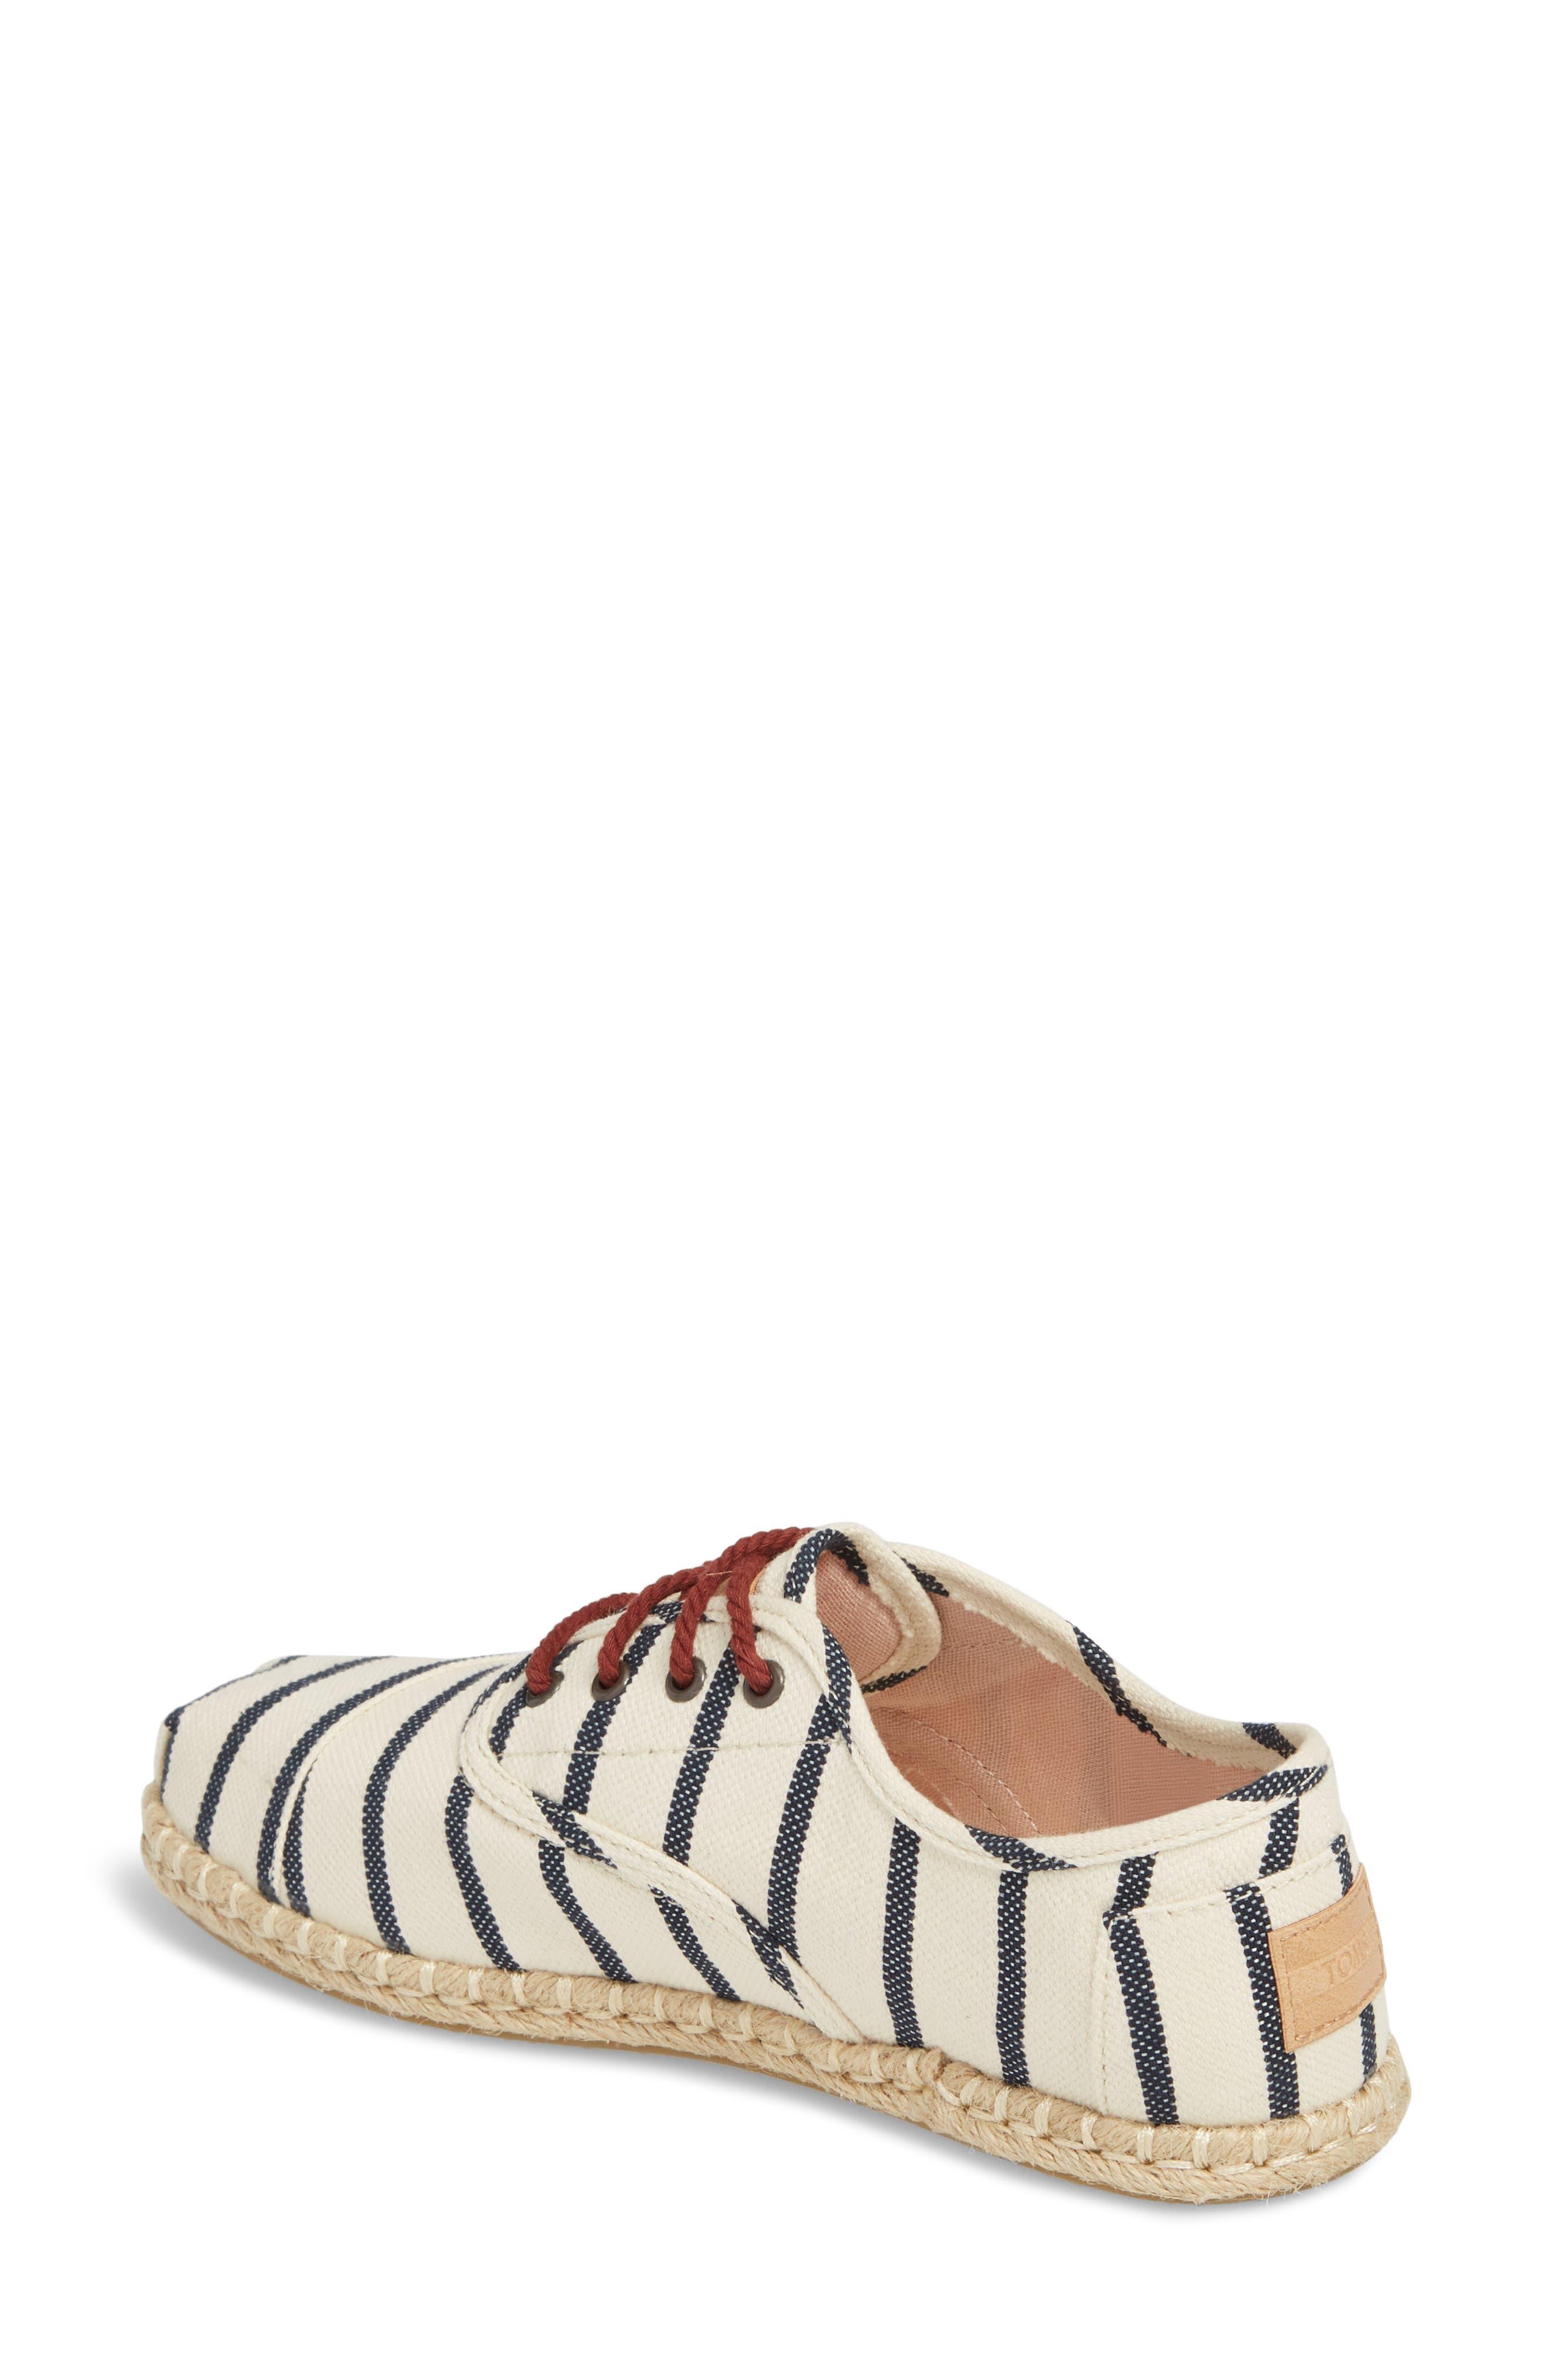 Cordones Sneaker,                             Alternate thumbnail 2, color,                             900